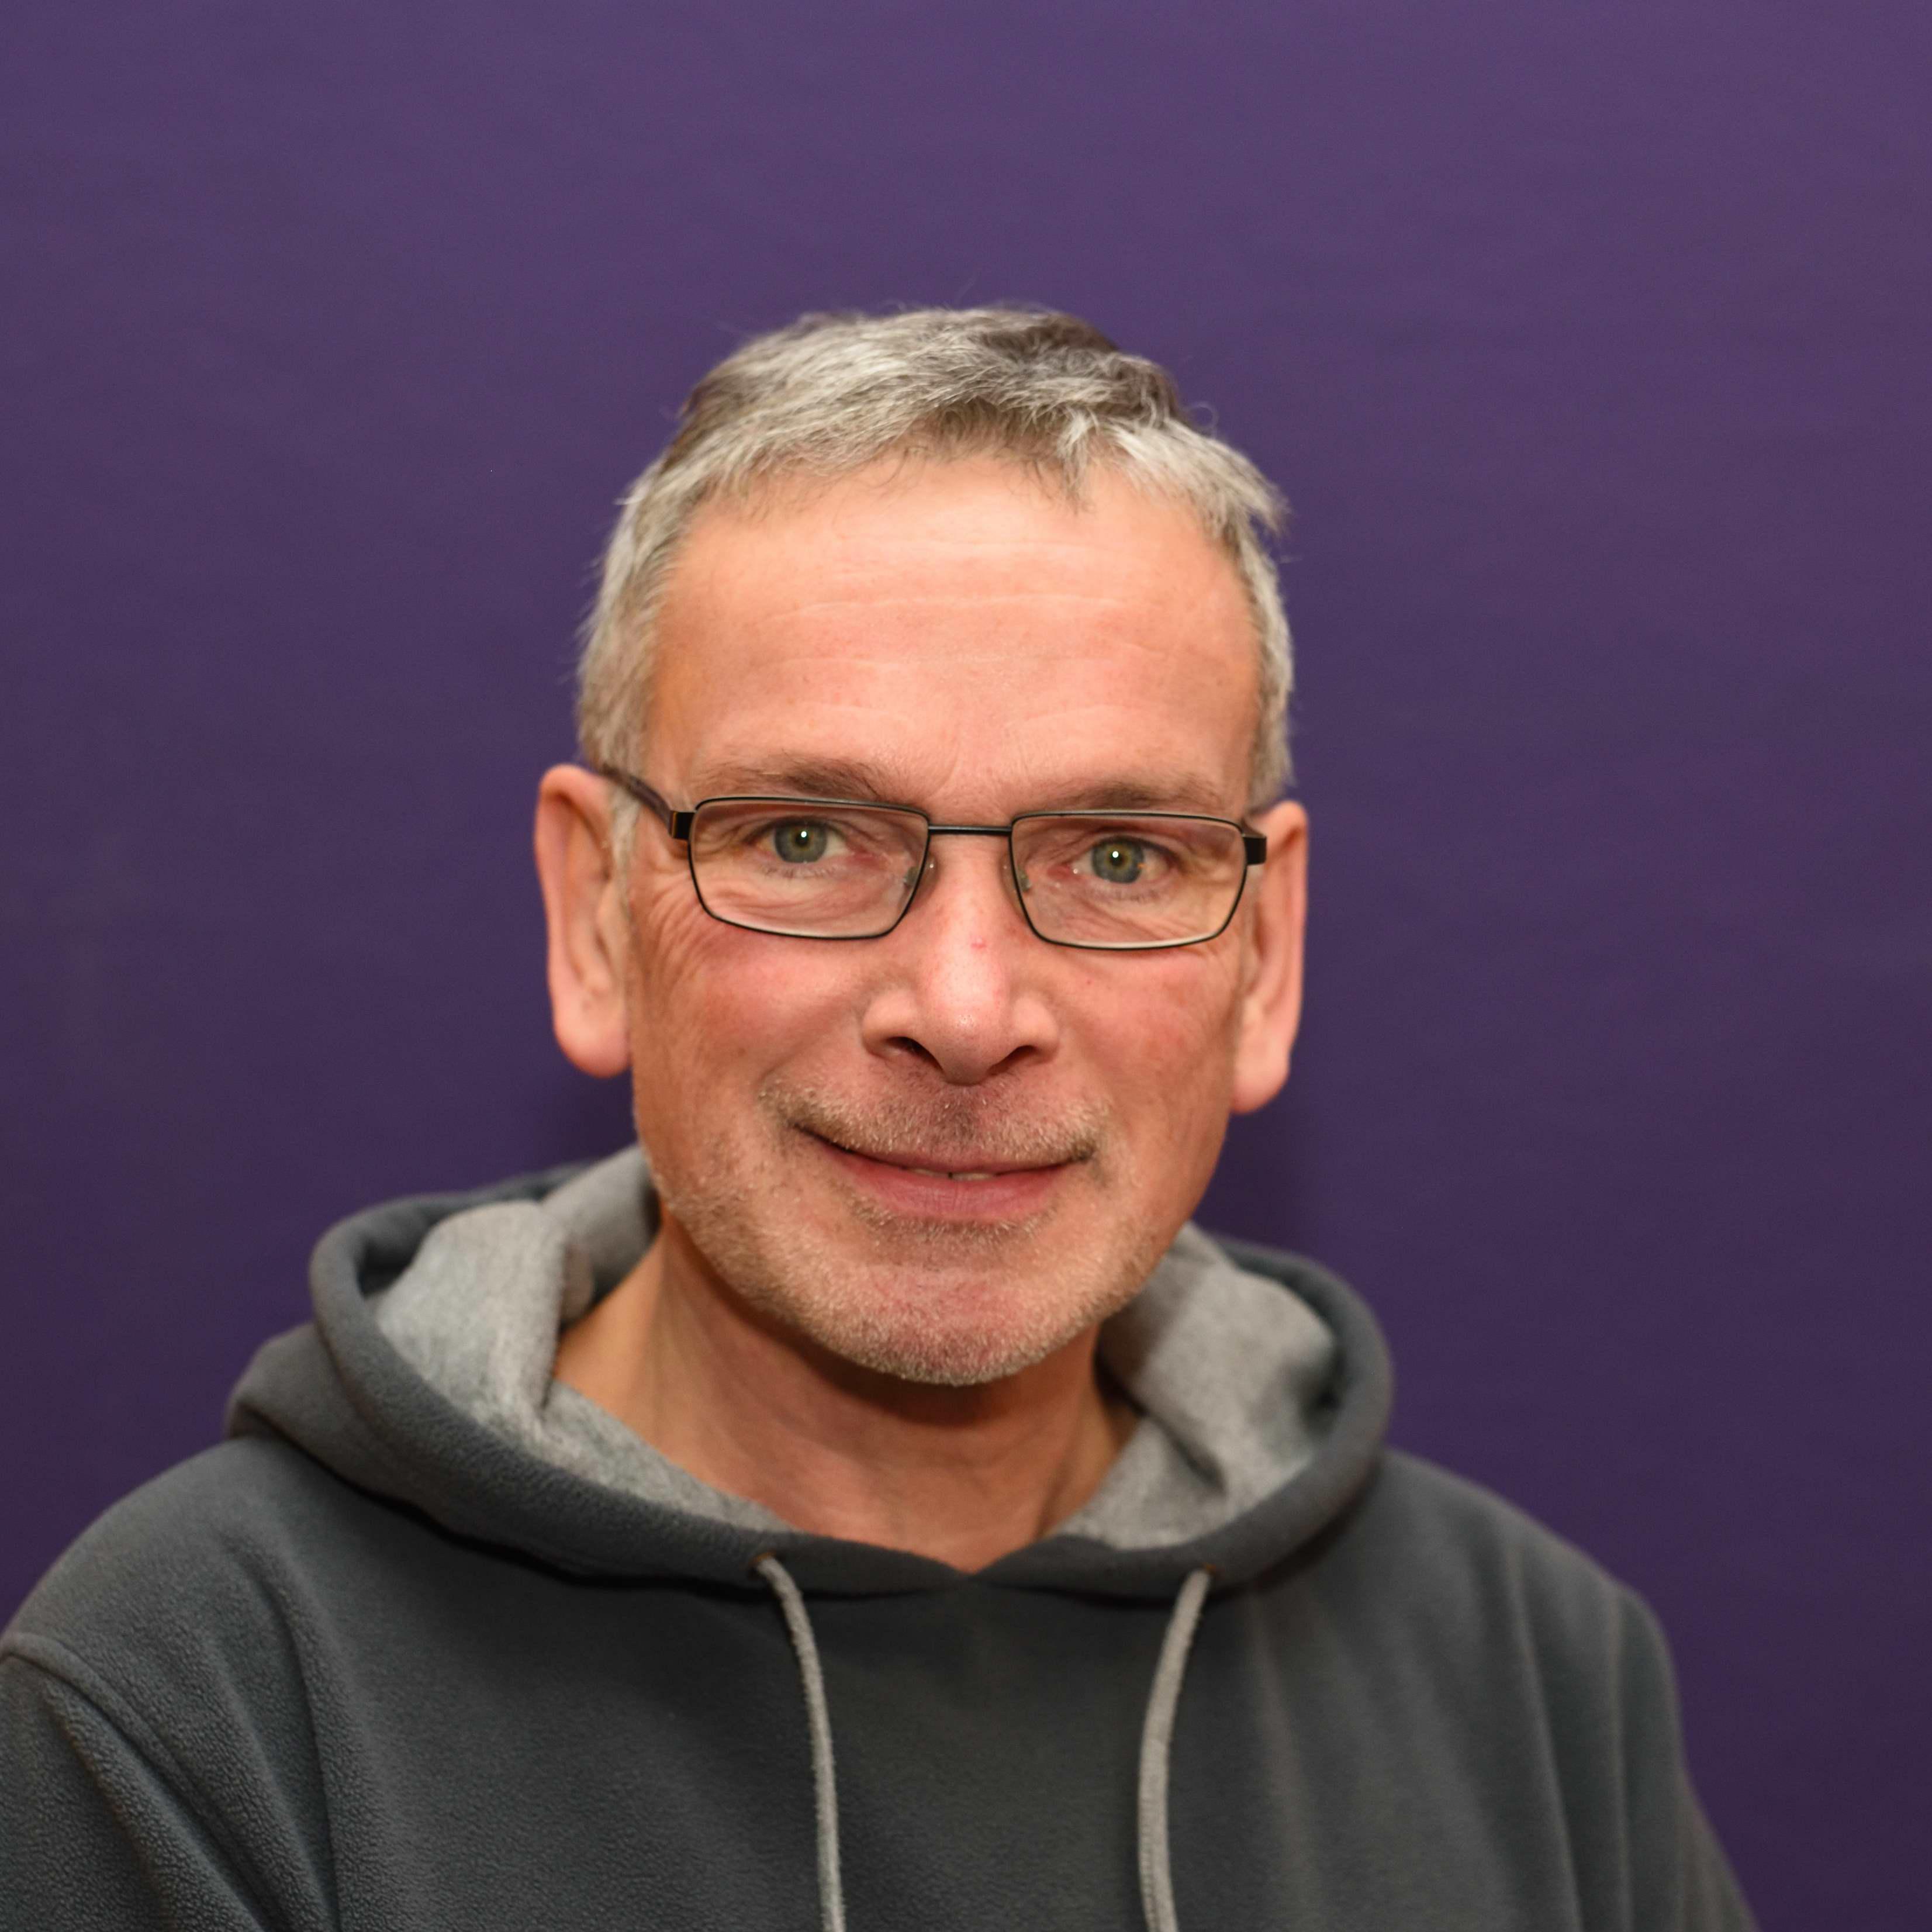 Dr. Thomas Ostendorff